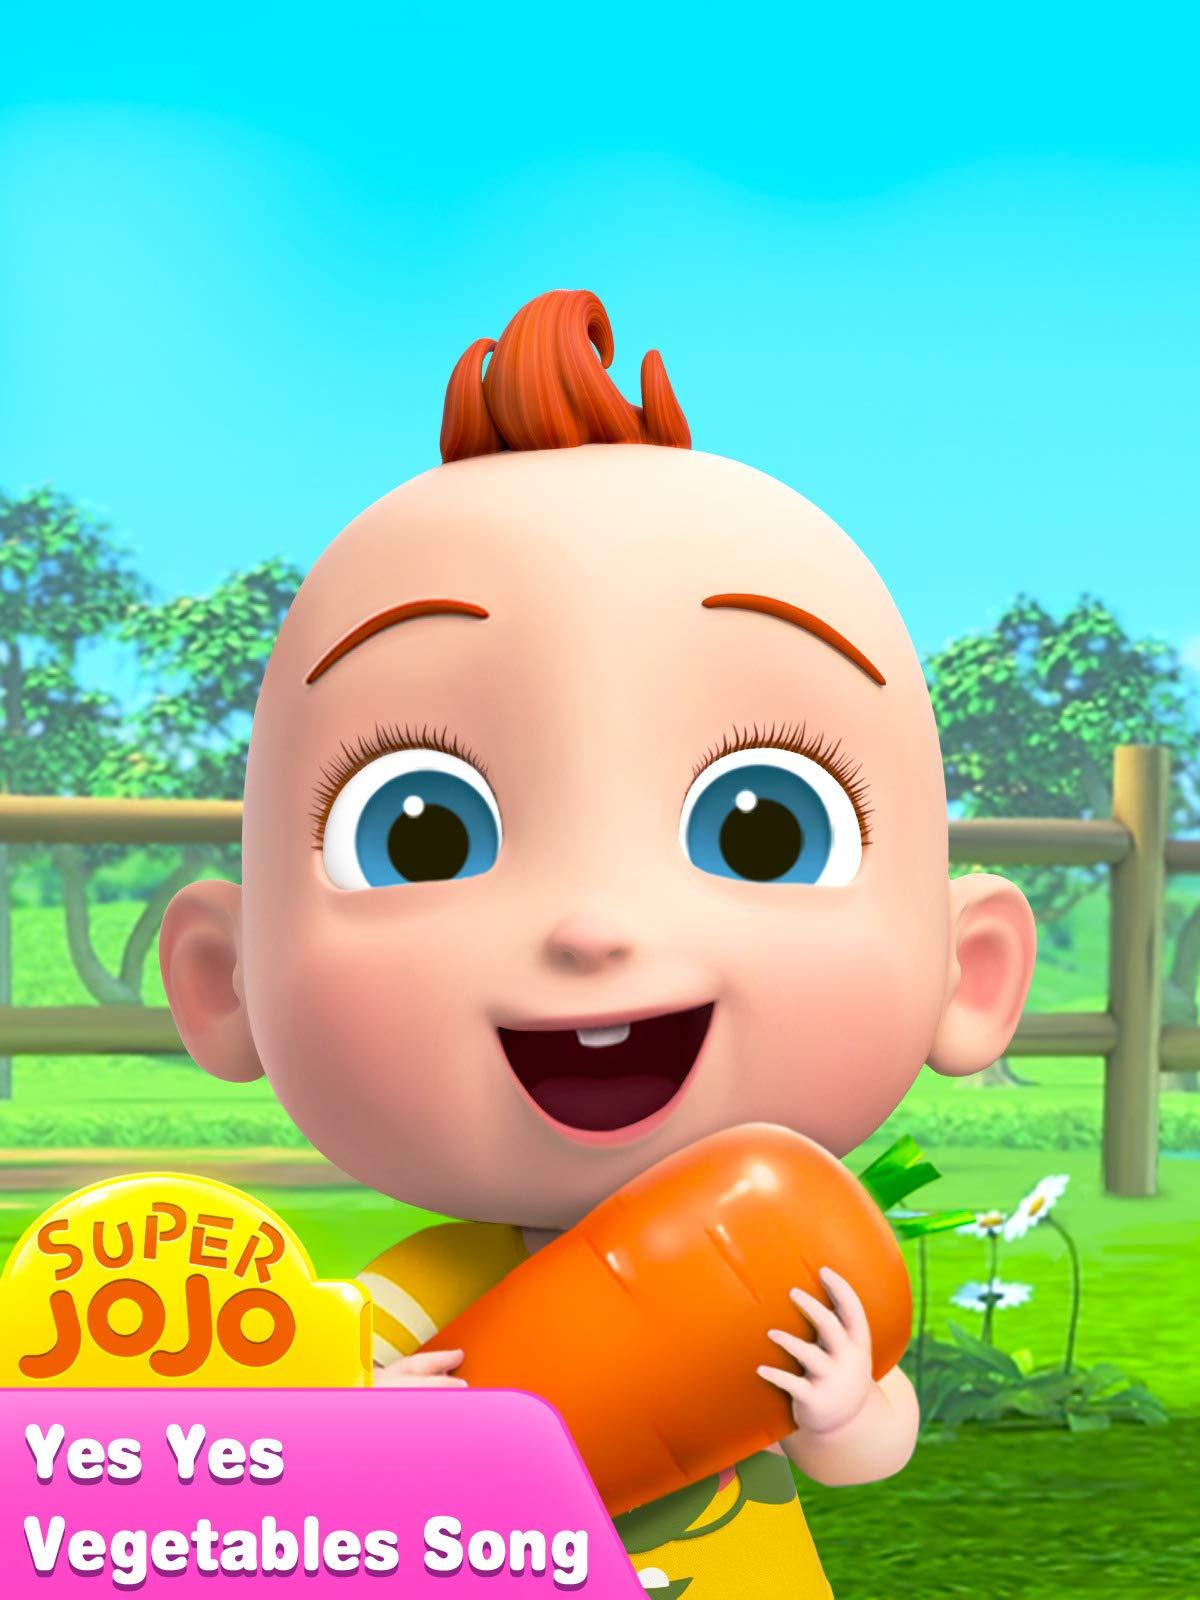 Super JoJo - Yes Yes Vegetables Song